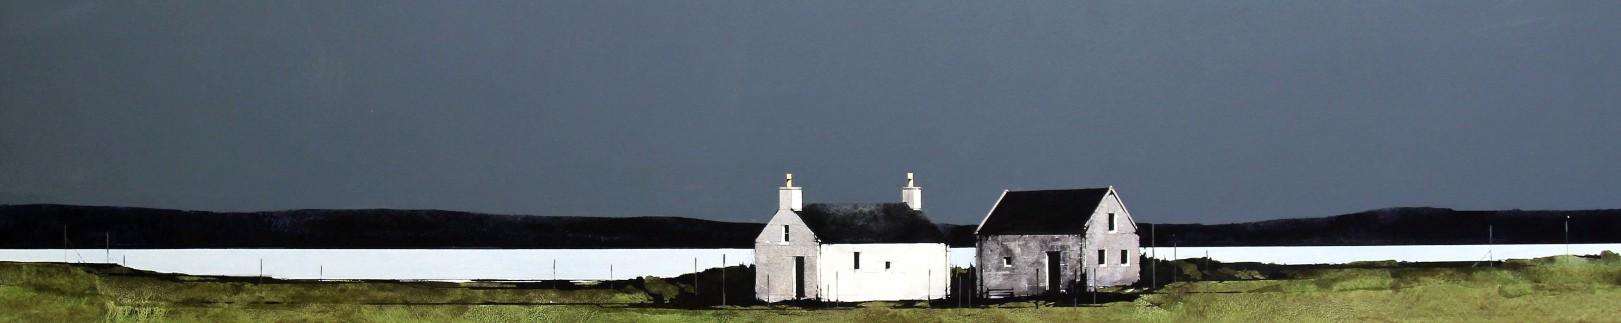 Ron Lawson_Cottages on Gigha II_EAS608_Watercolour & Gouache_5.5x38.5